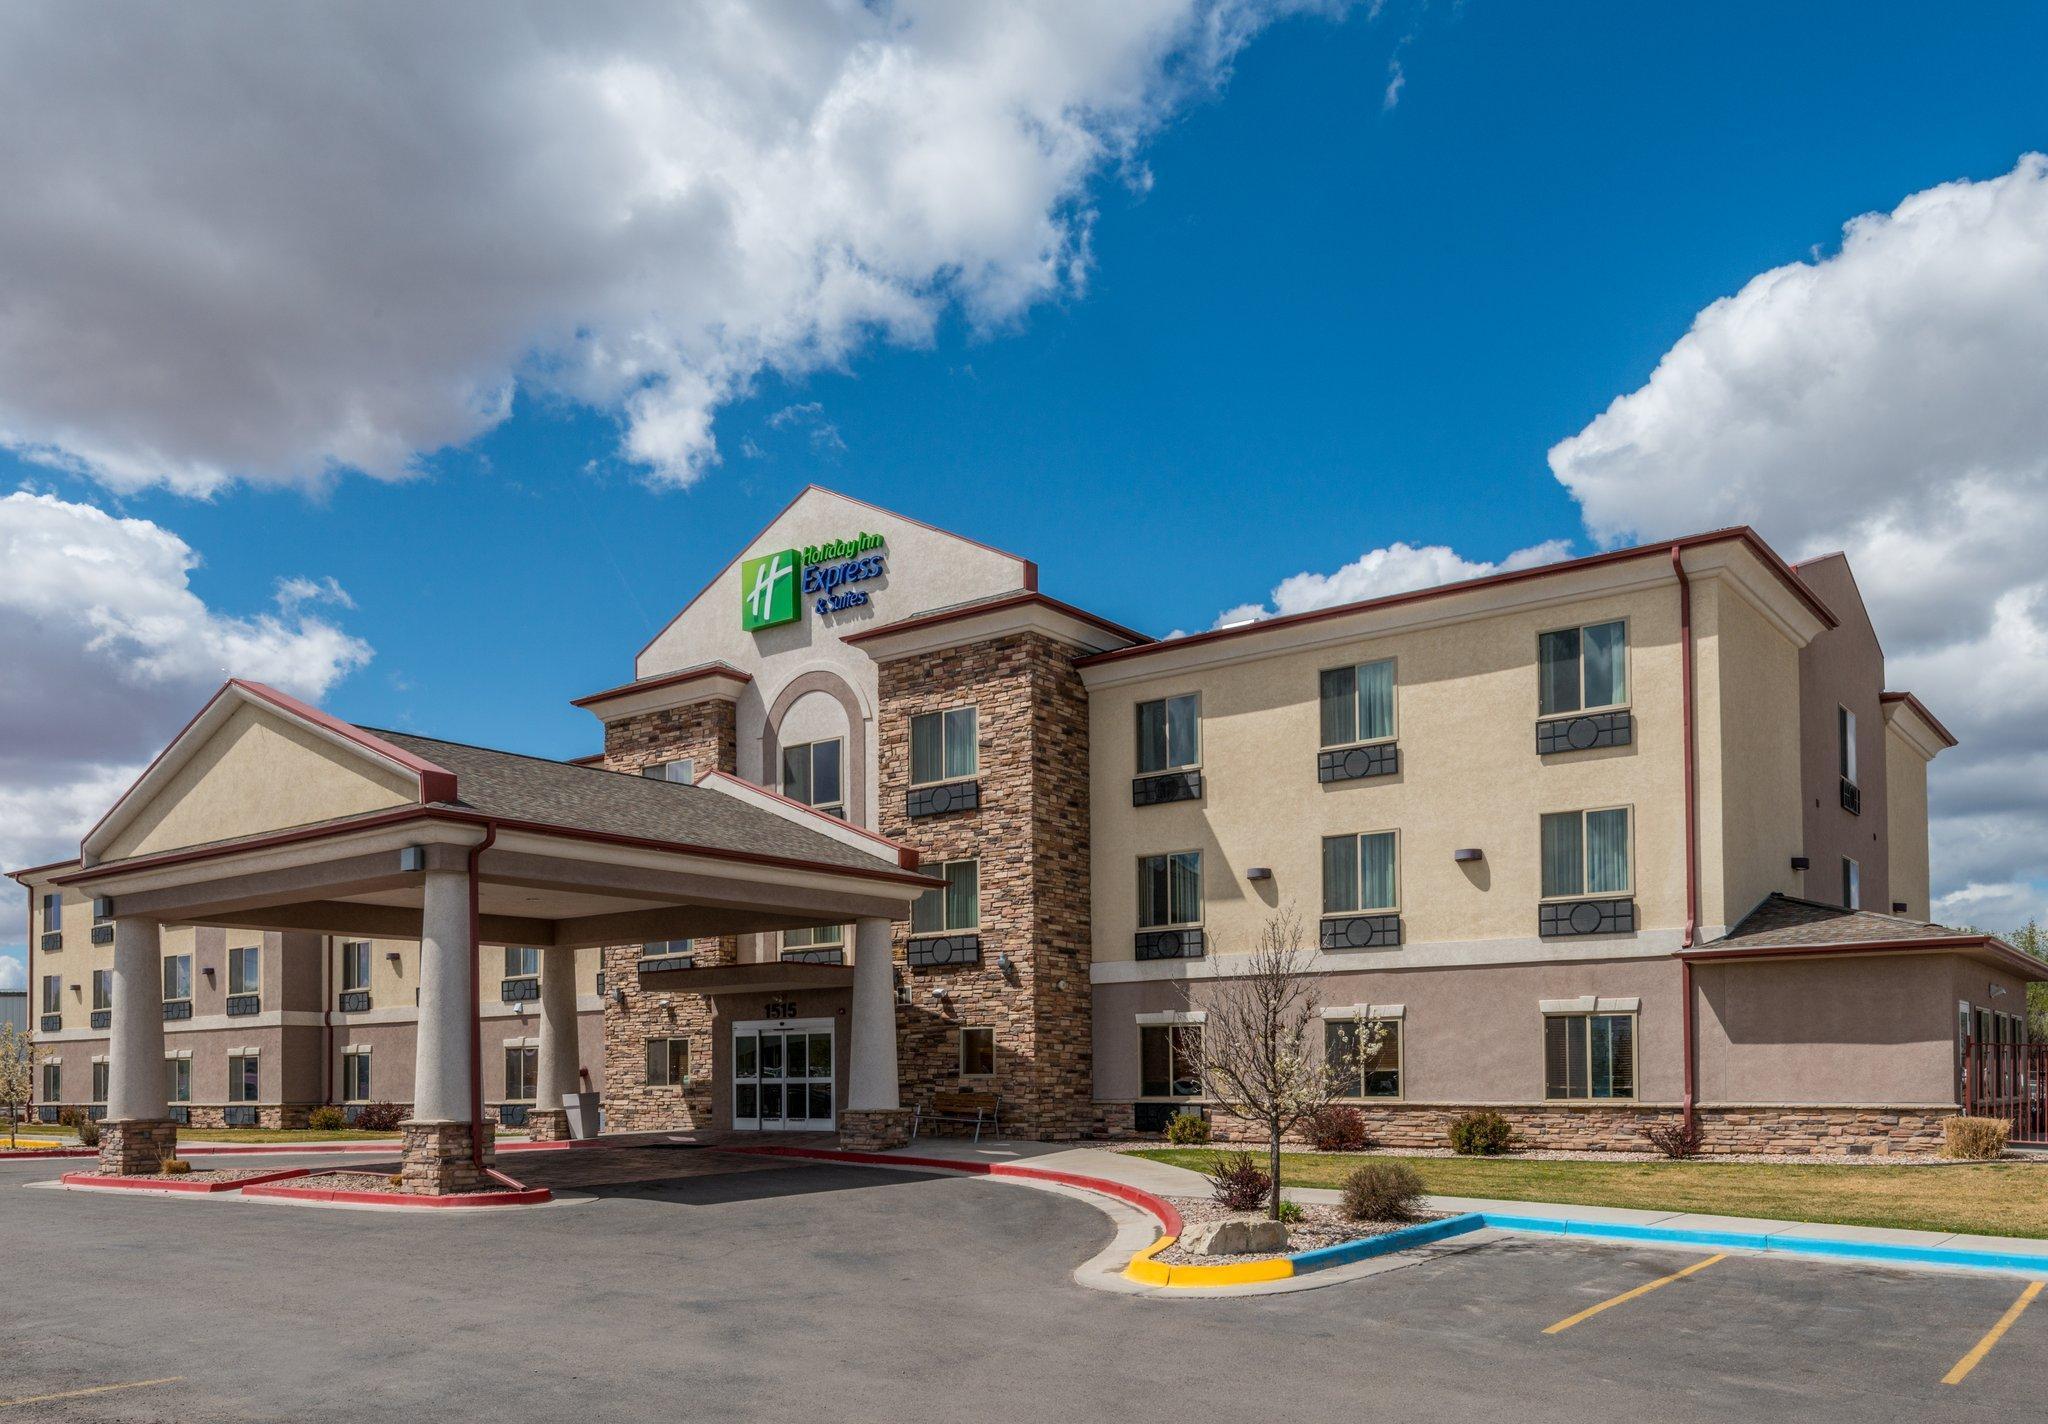 Holiday Inn Express Hotel Vernal, Uintah